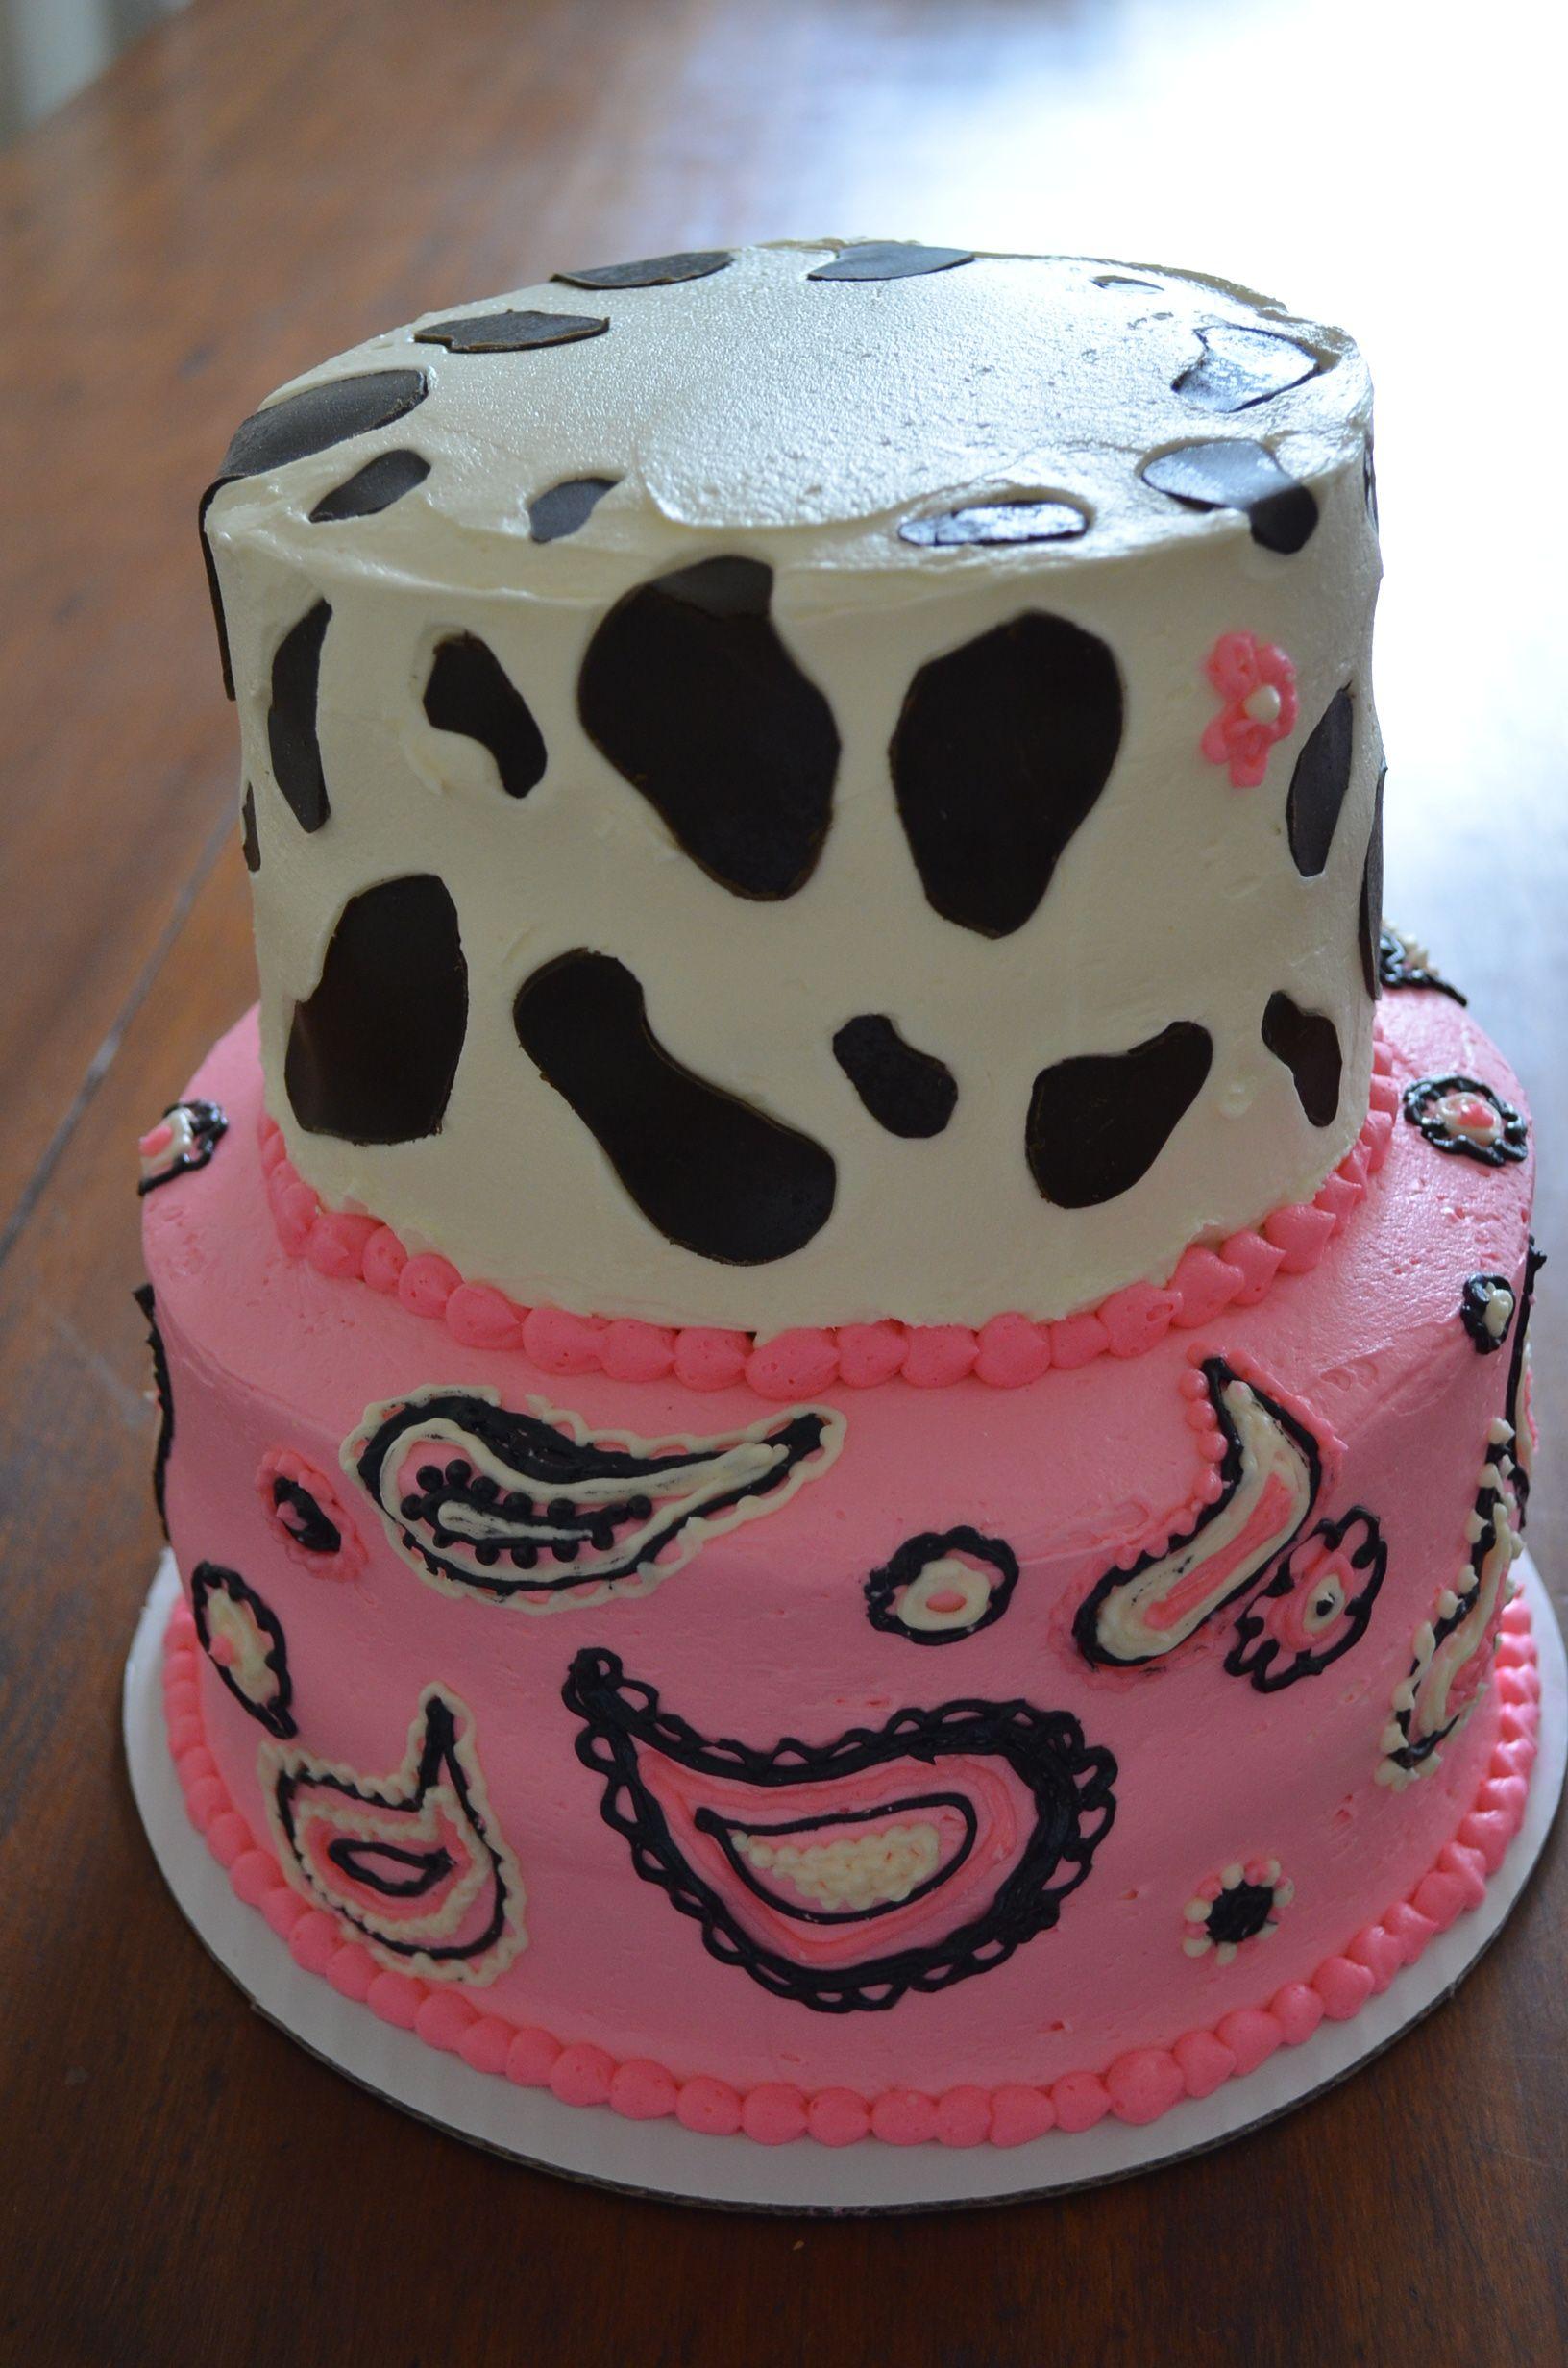 Cow Print Cake Thecakeshopmenu Cow Print Pinterest Cow Print